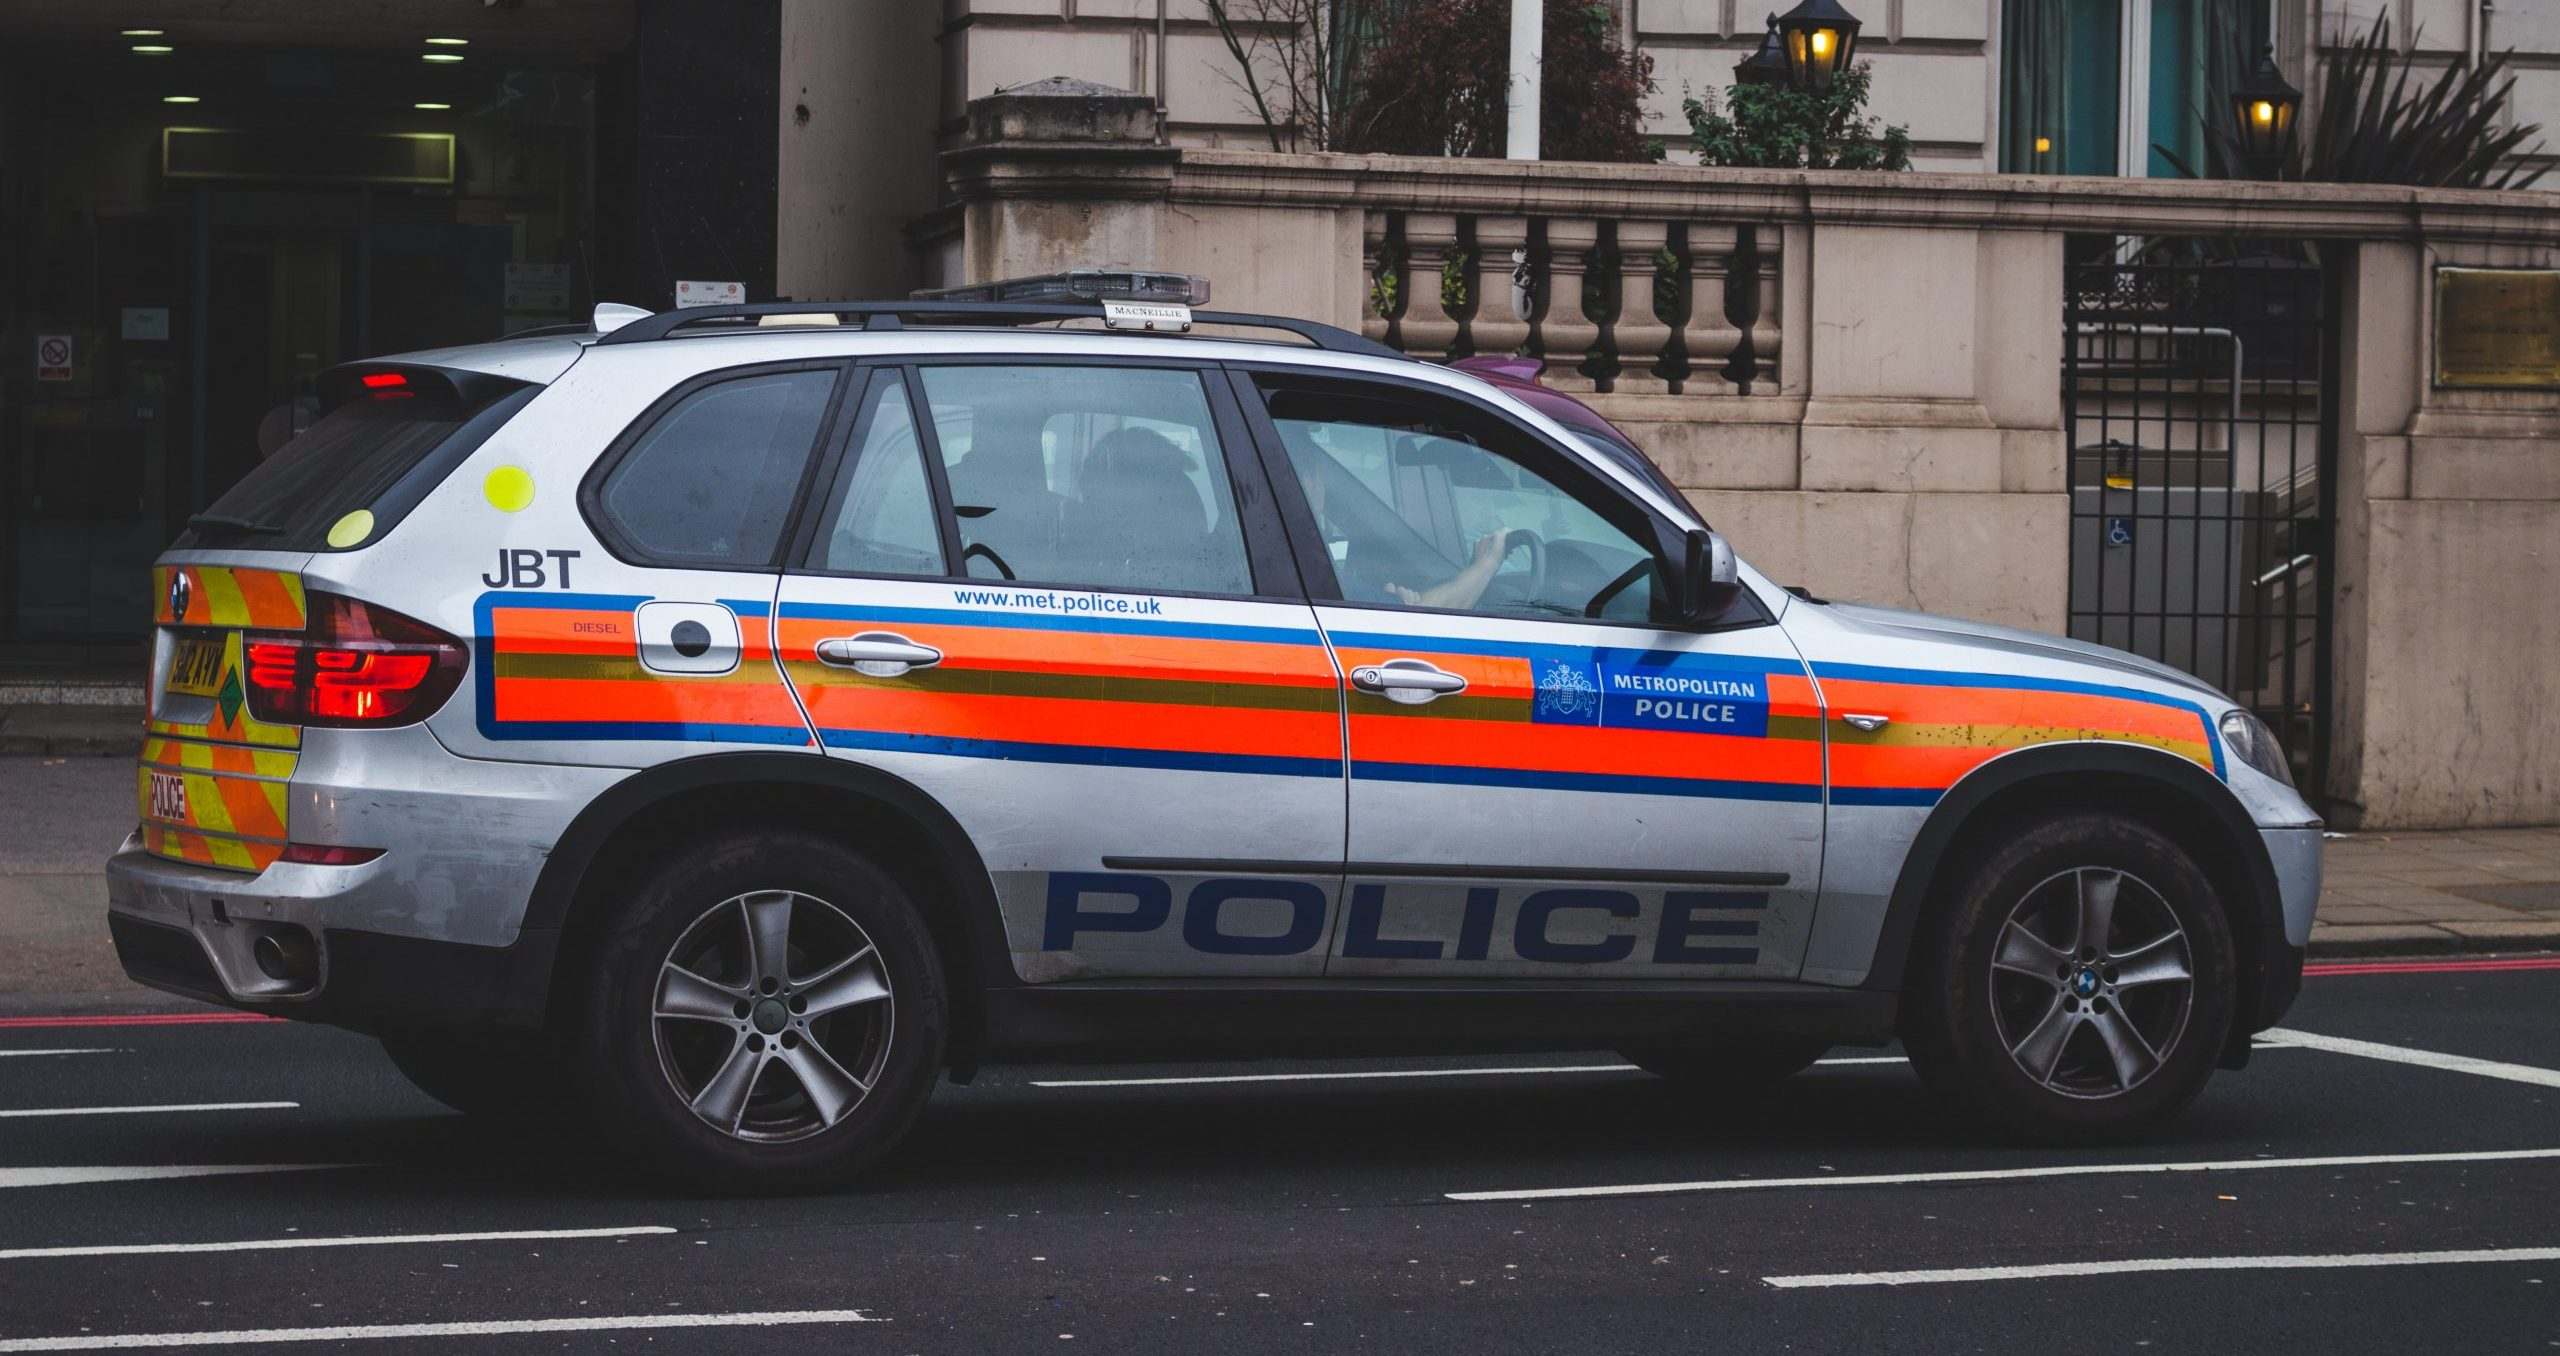 Coronavirus: UK police establish checkpoints to stop drivers making non-essential journeys